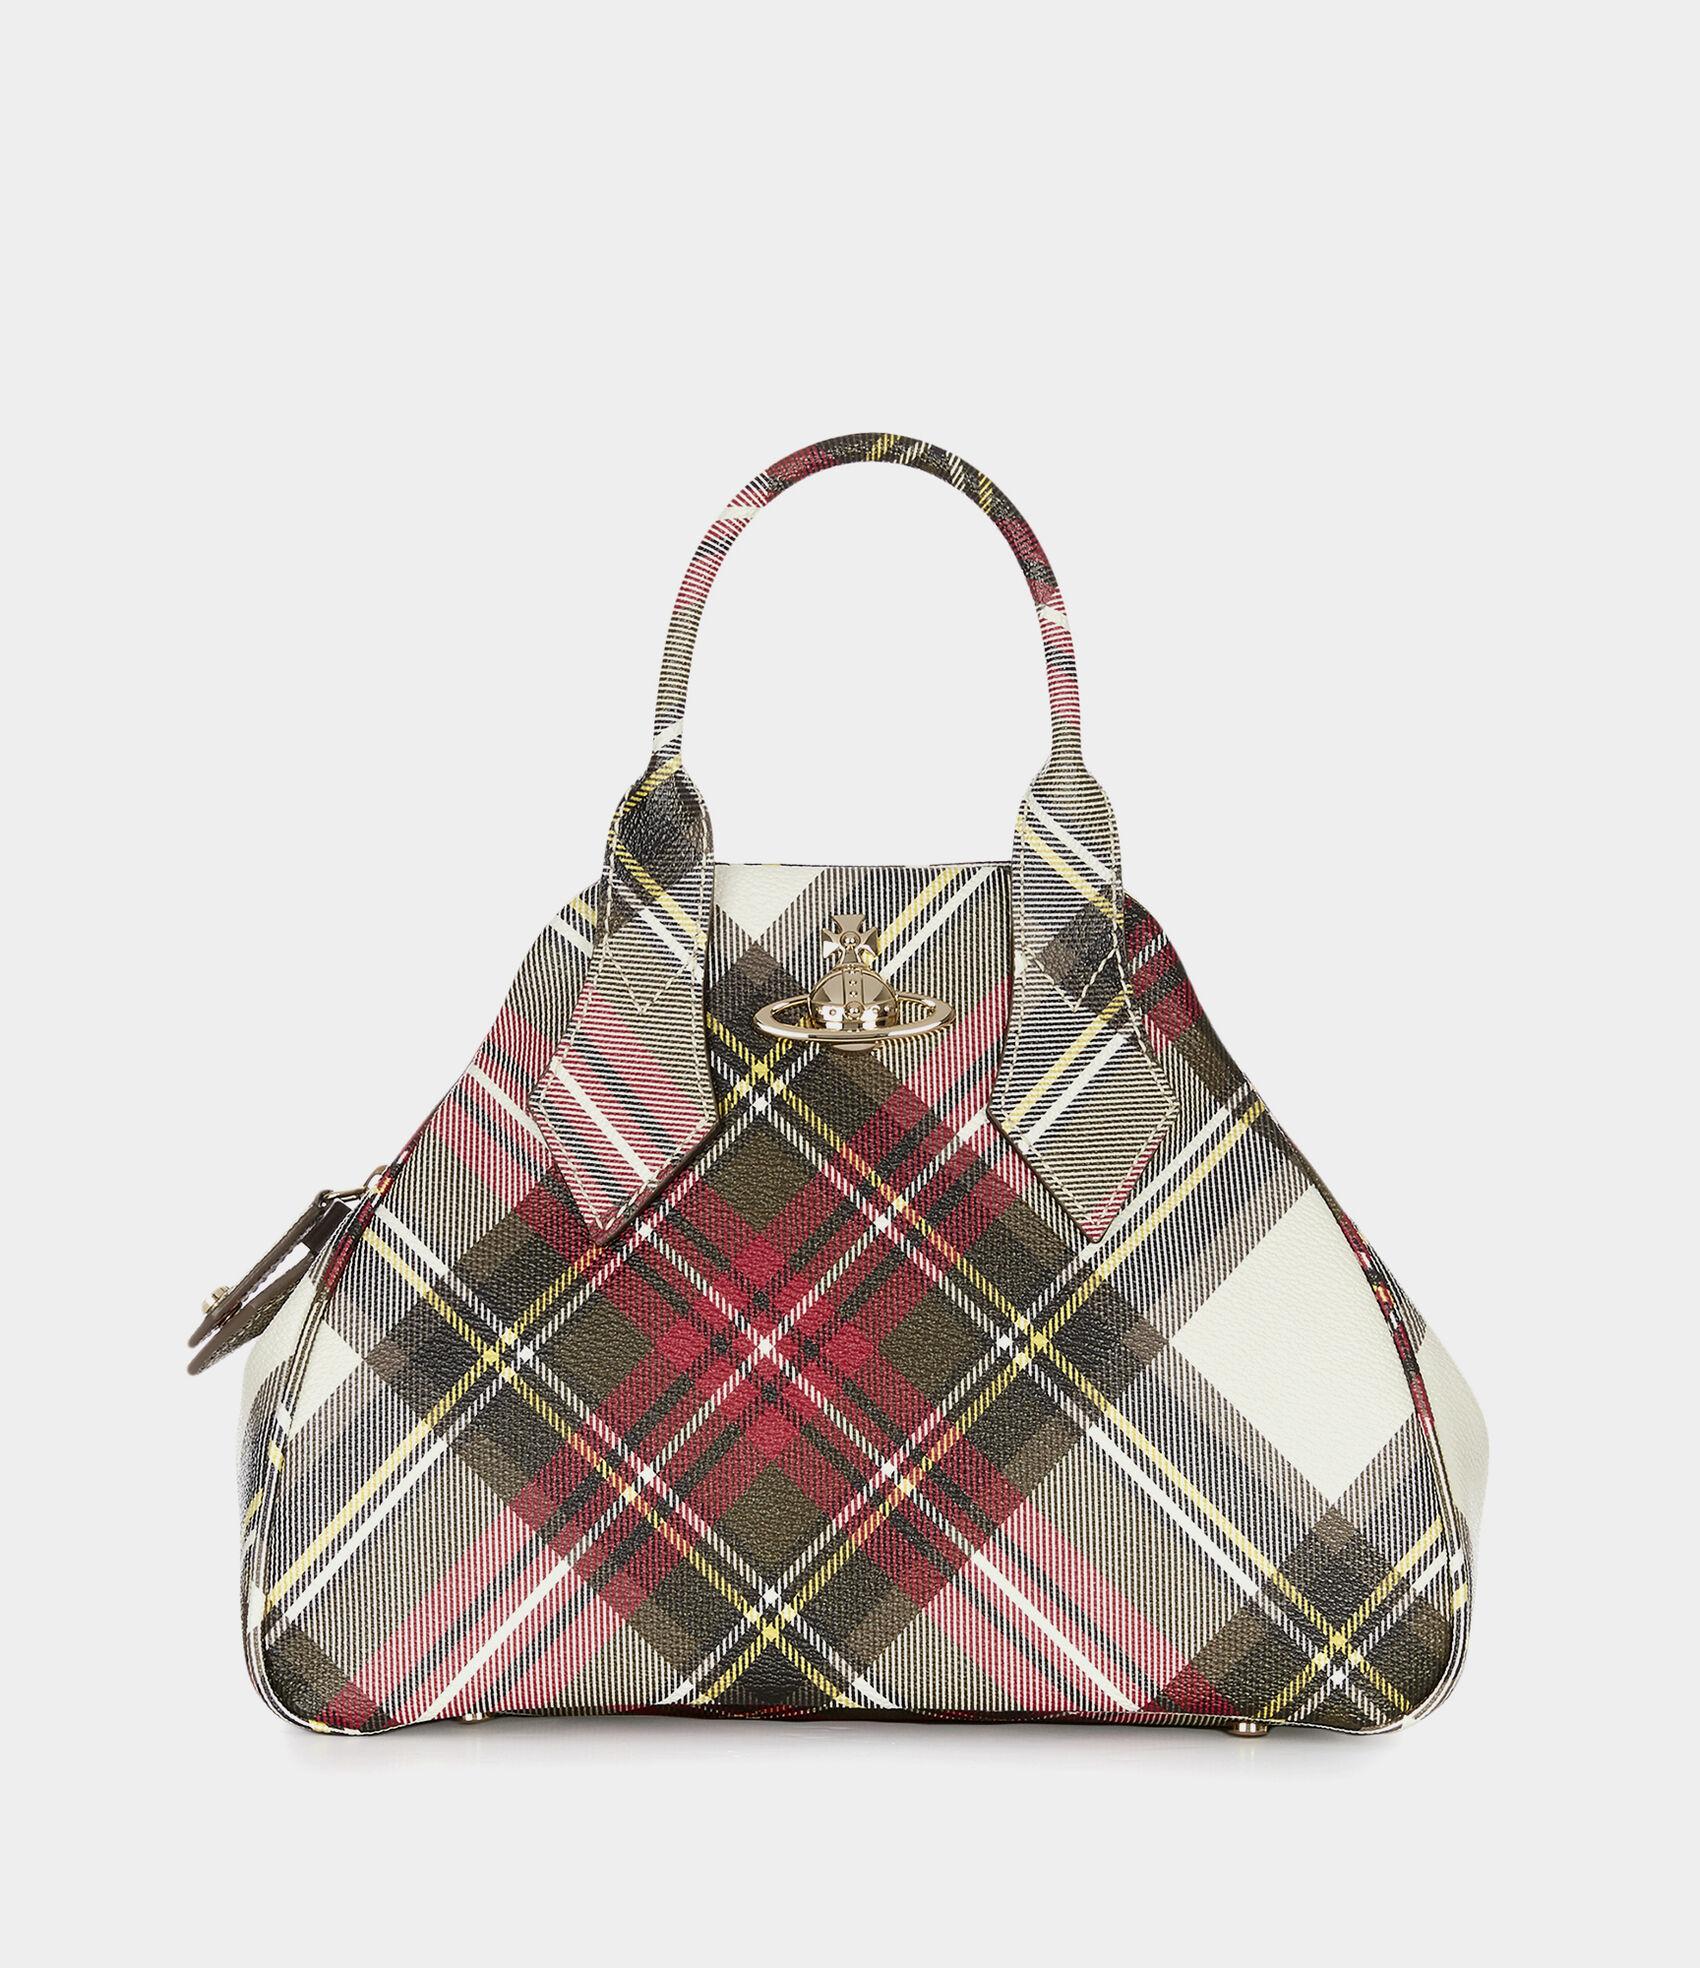 e1484c9a89 Derby Medium Yasmine | Women's Handbags | Vivienne Westwood